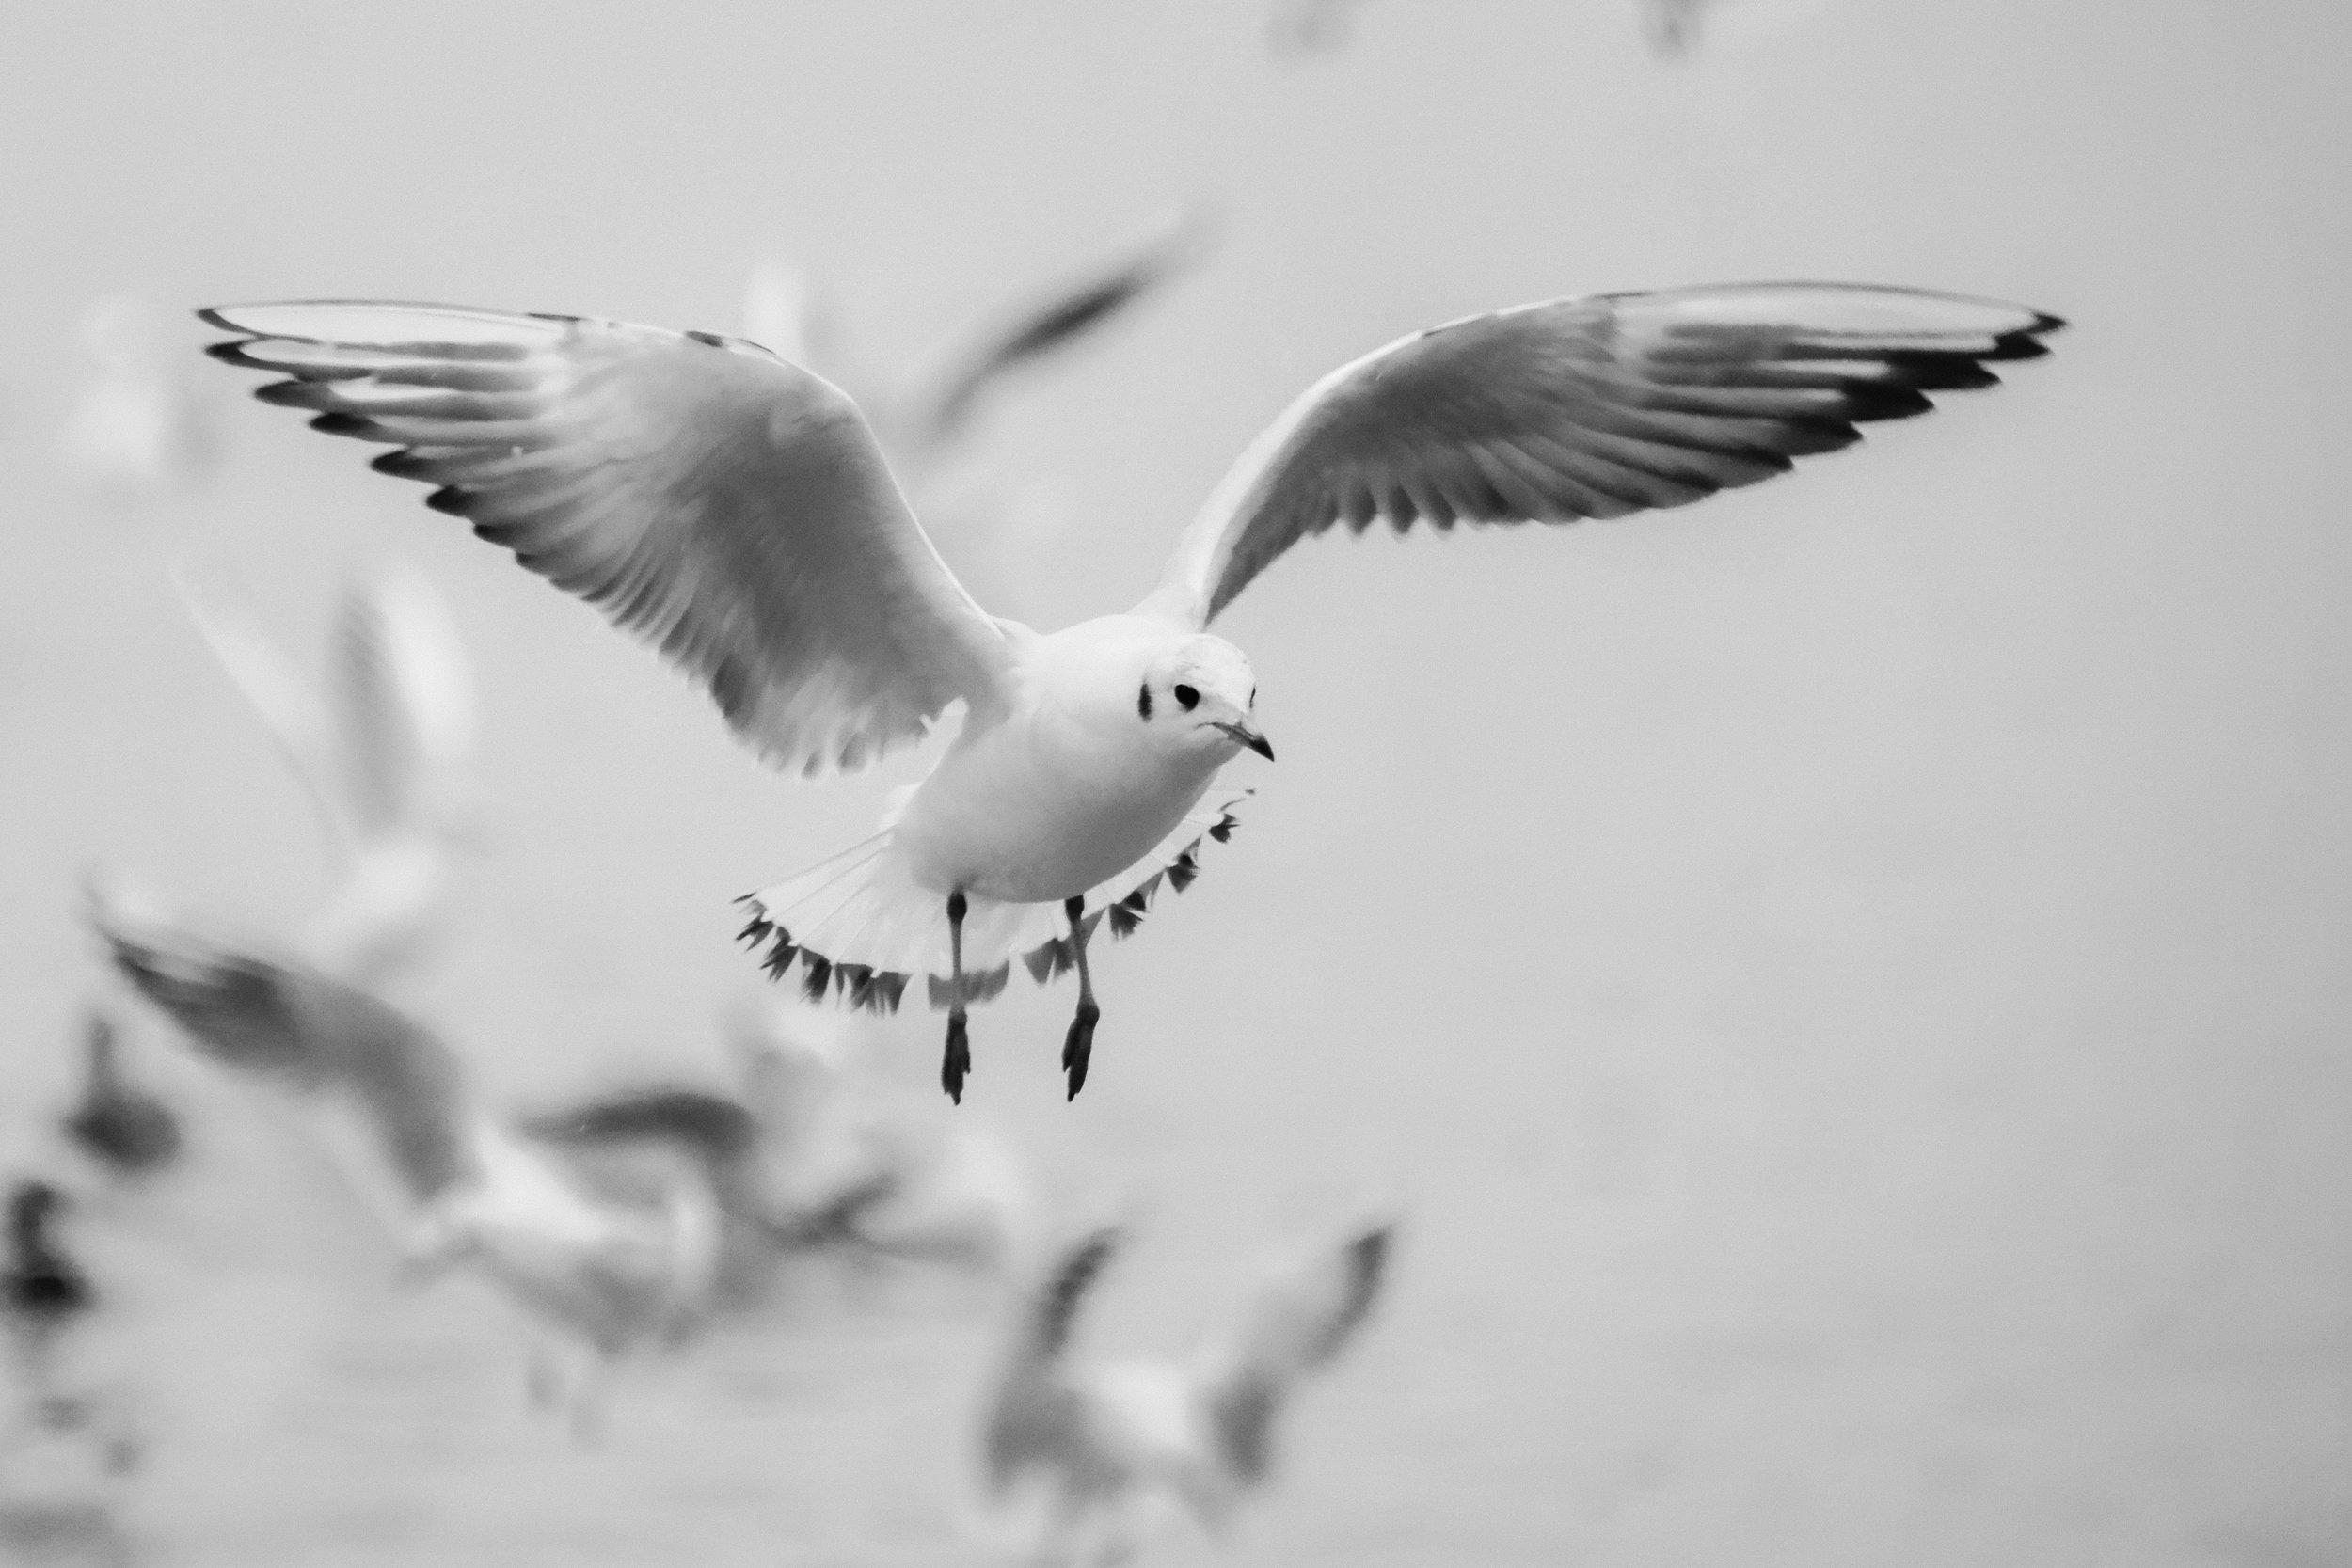 seagull-flight-bird-beach-60116.jpeg